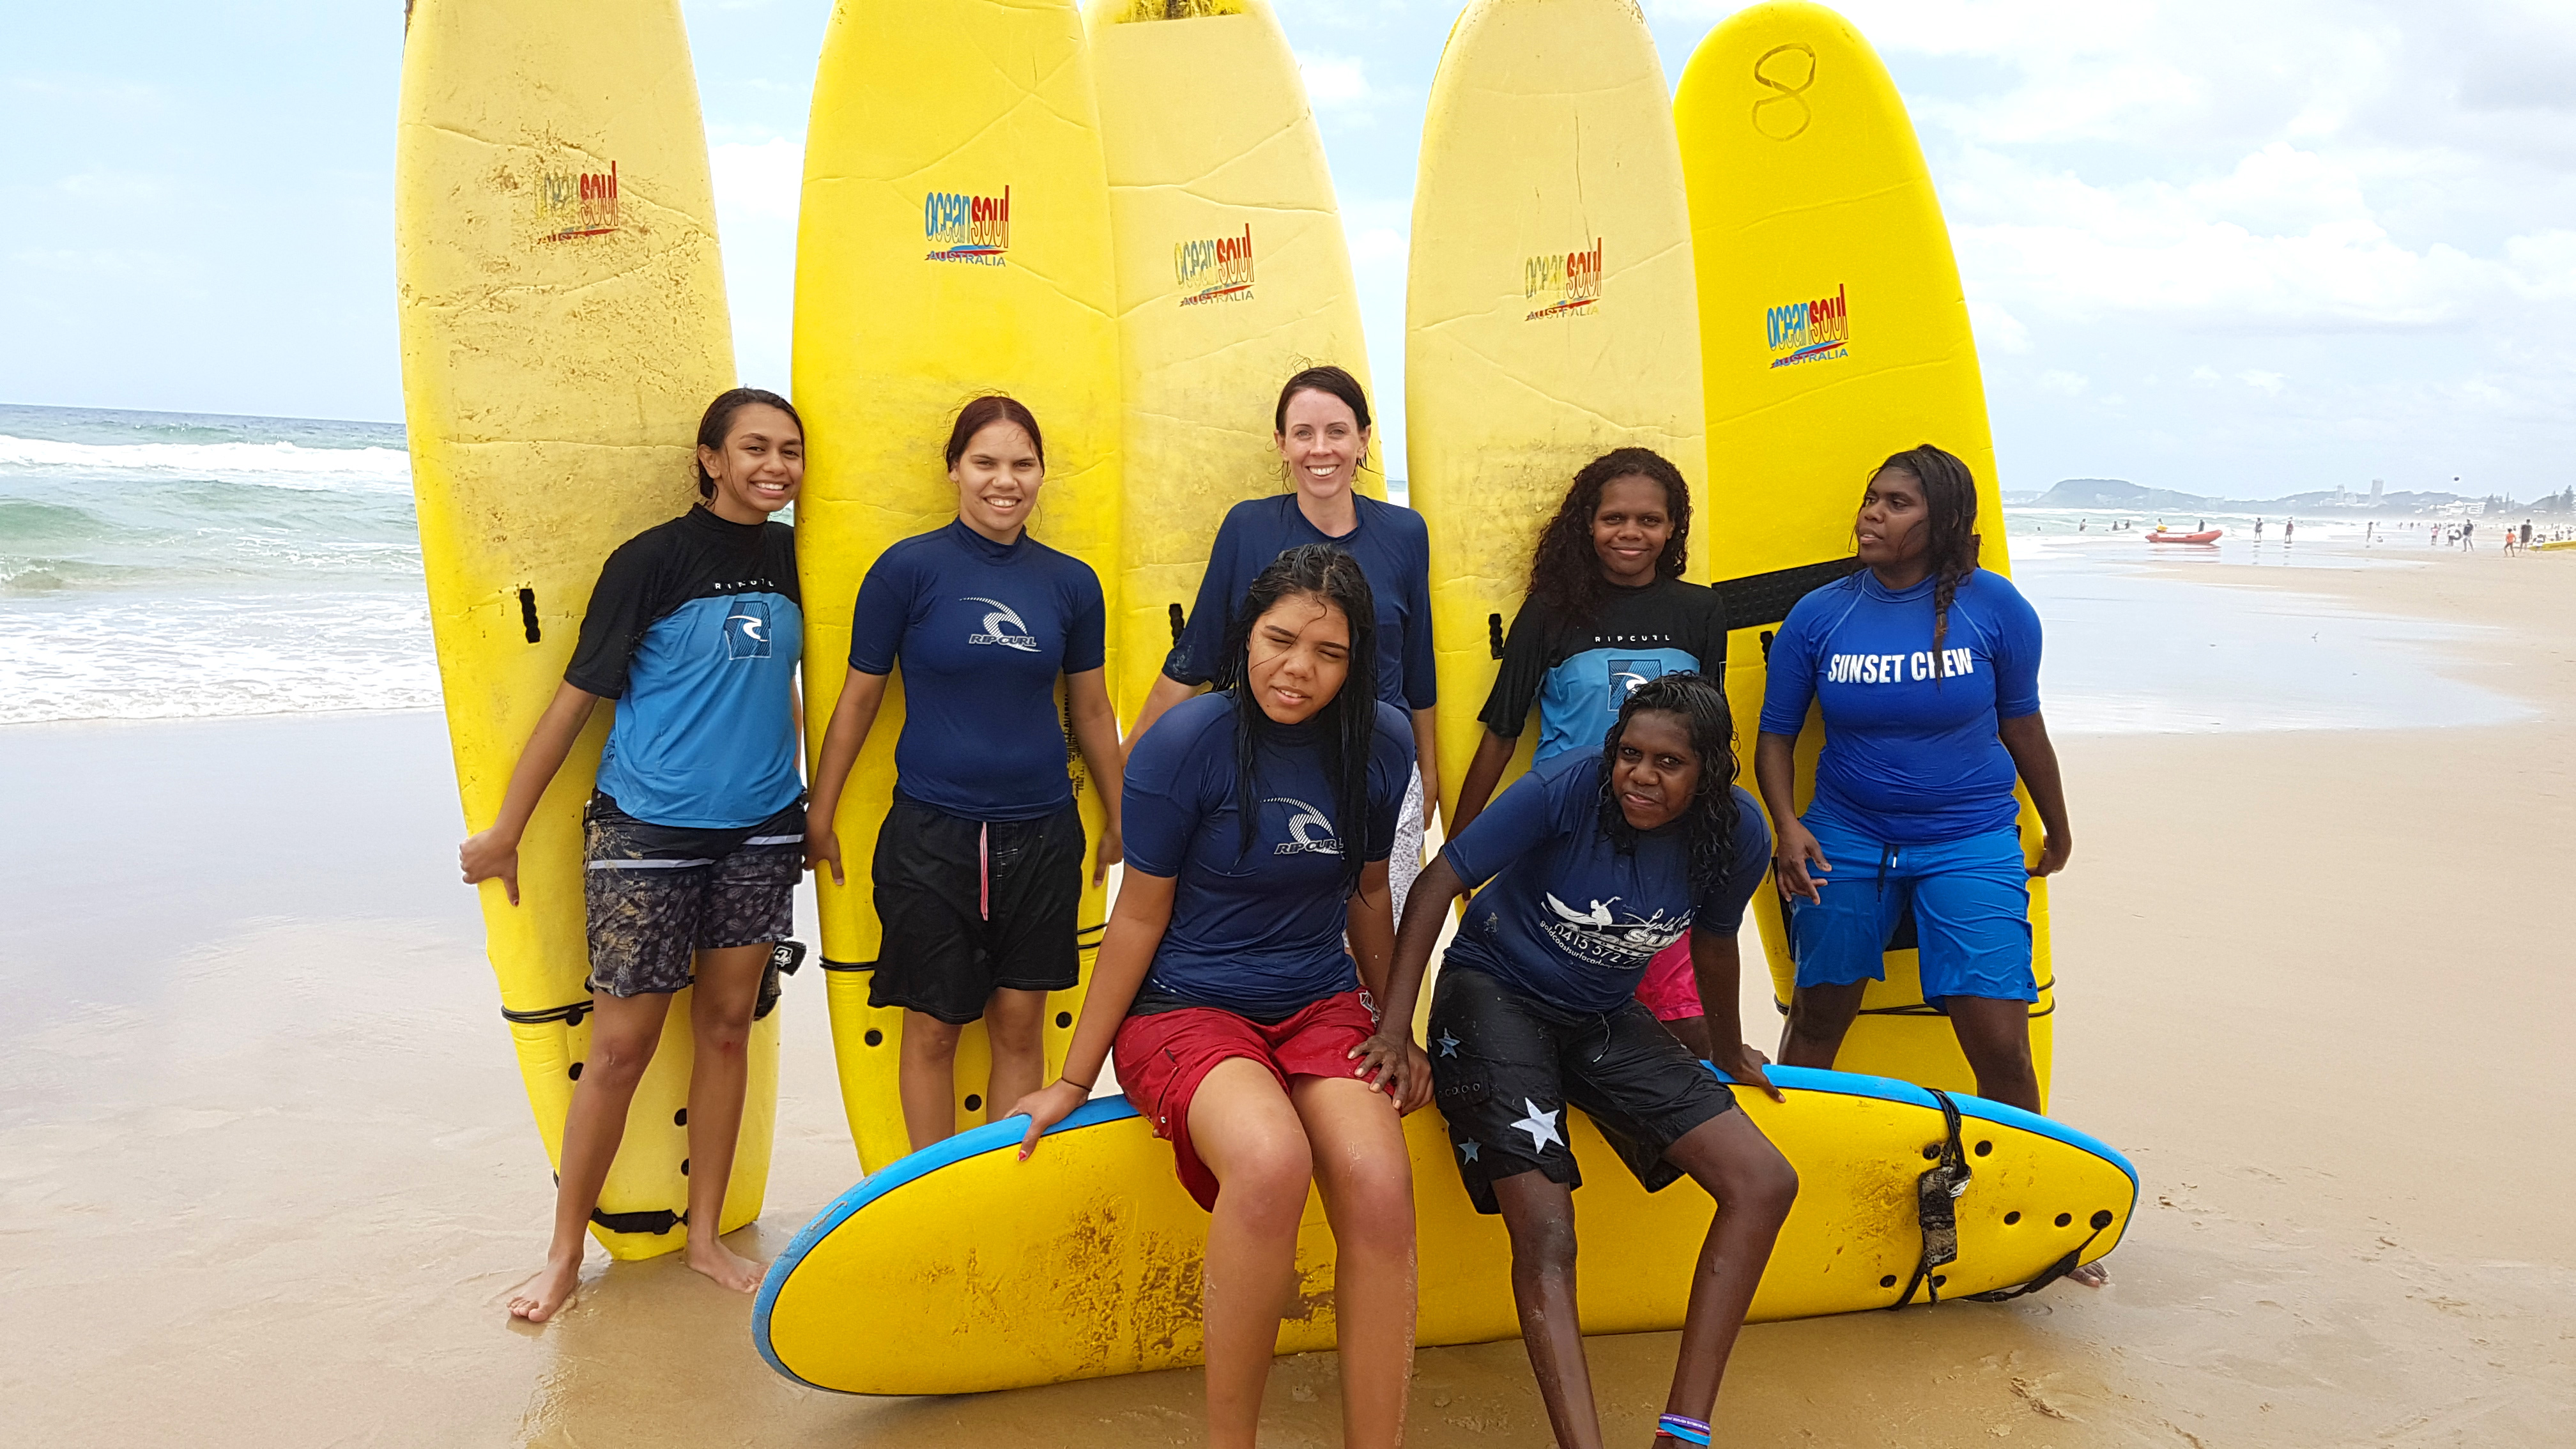 Stars_girls_after_surfing